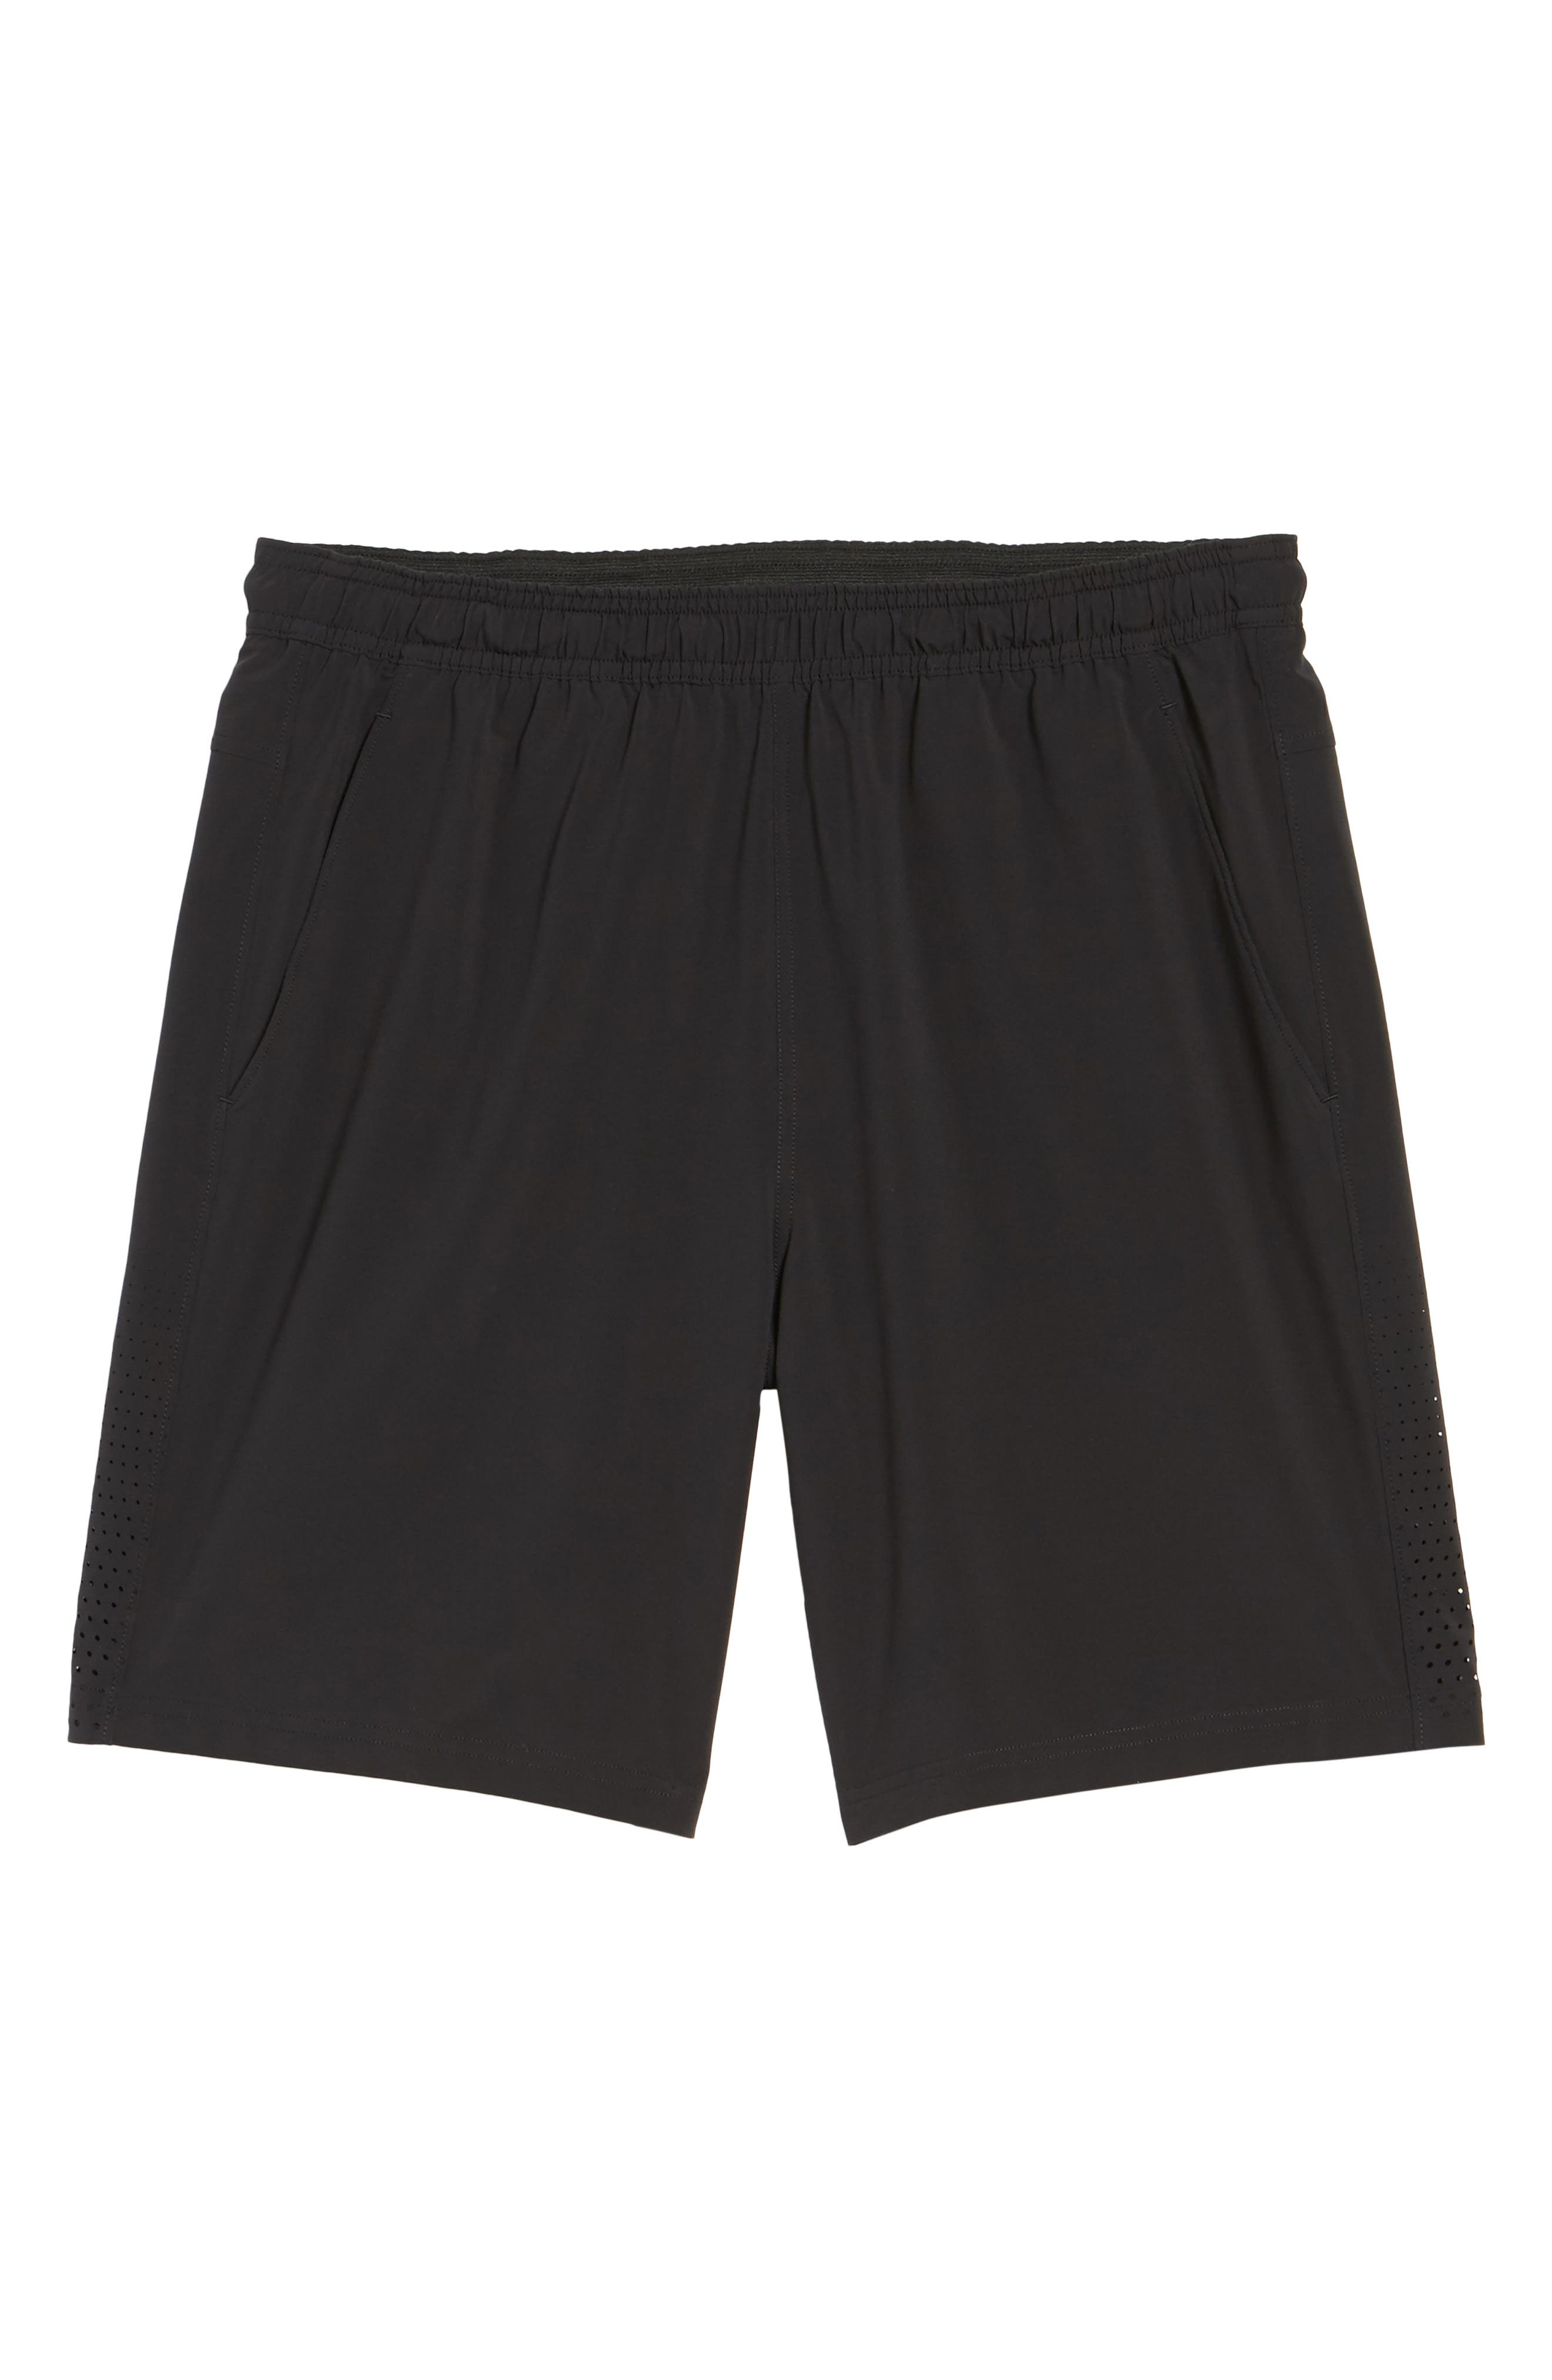 Graphite Core Athletic Shorts,                             Alternate thumbnail 6, color,                             BLACK